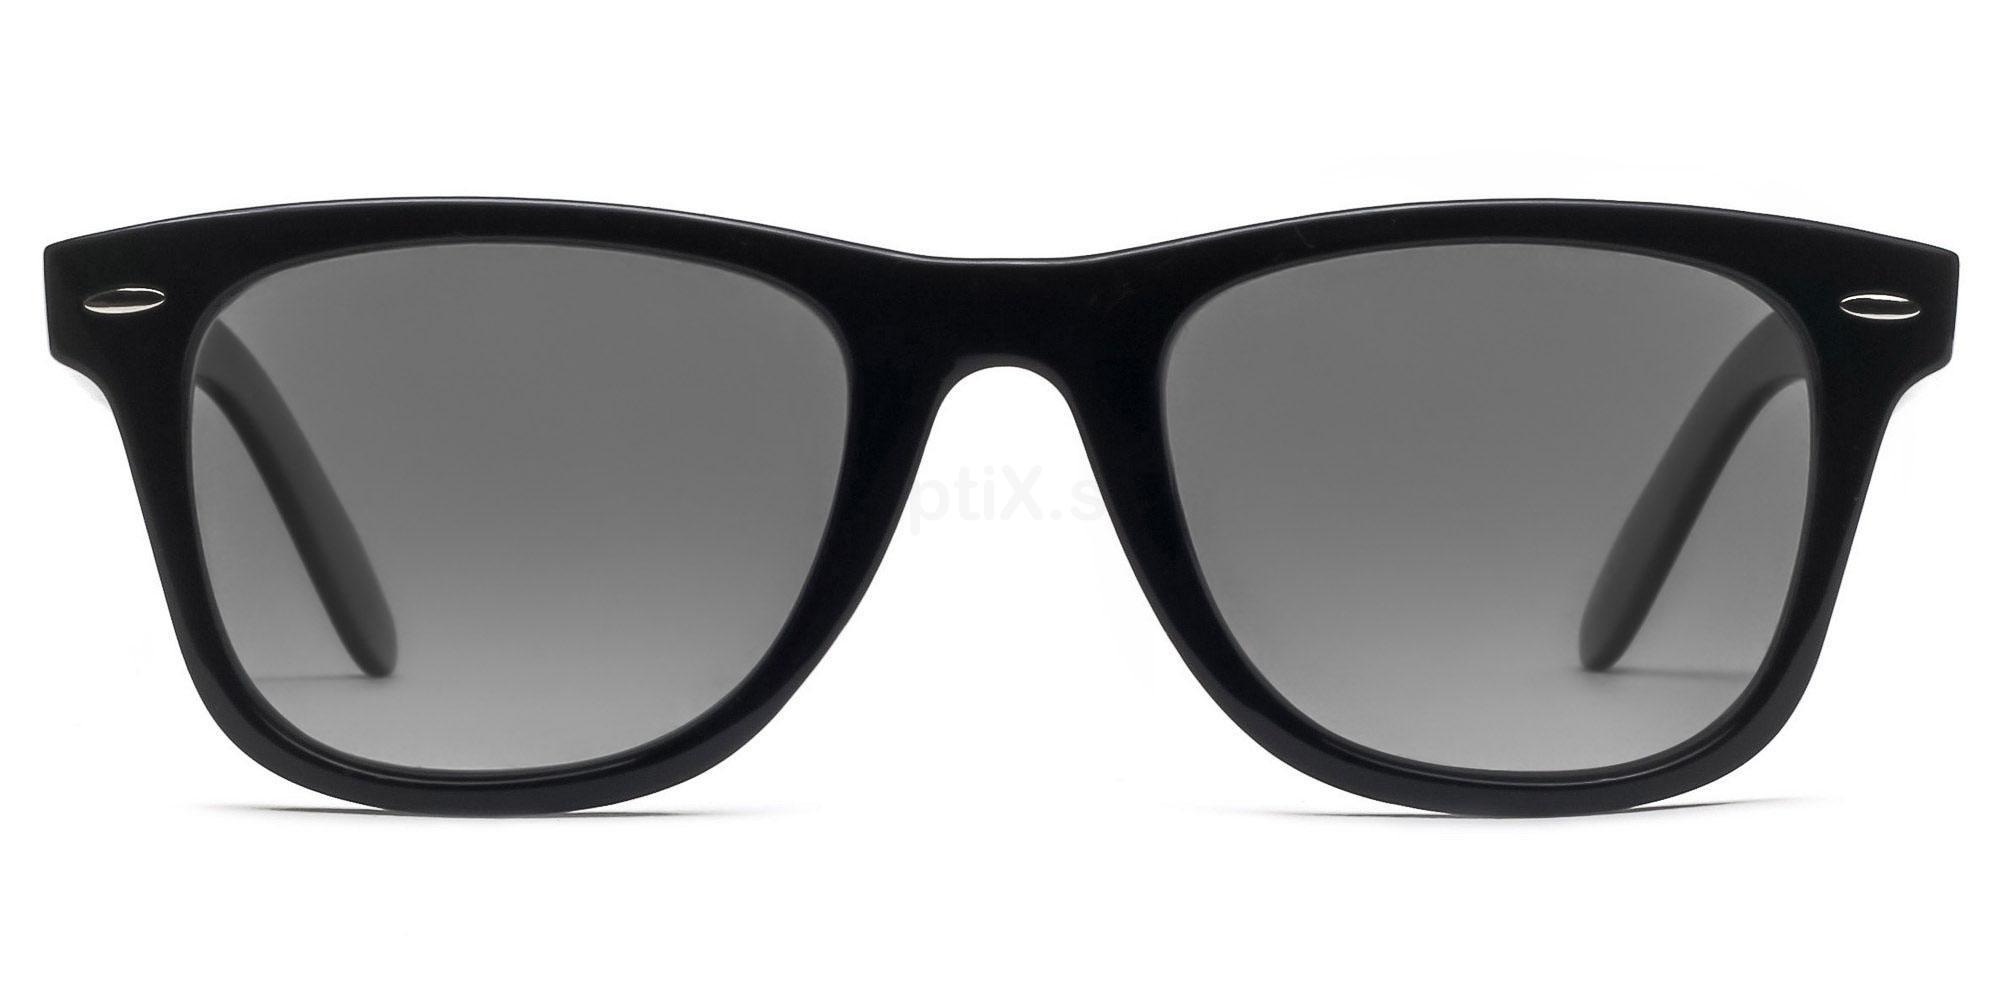 C01 Polarized Grey P2429 - Black (Polarized) Sunglasses, Savannah